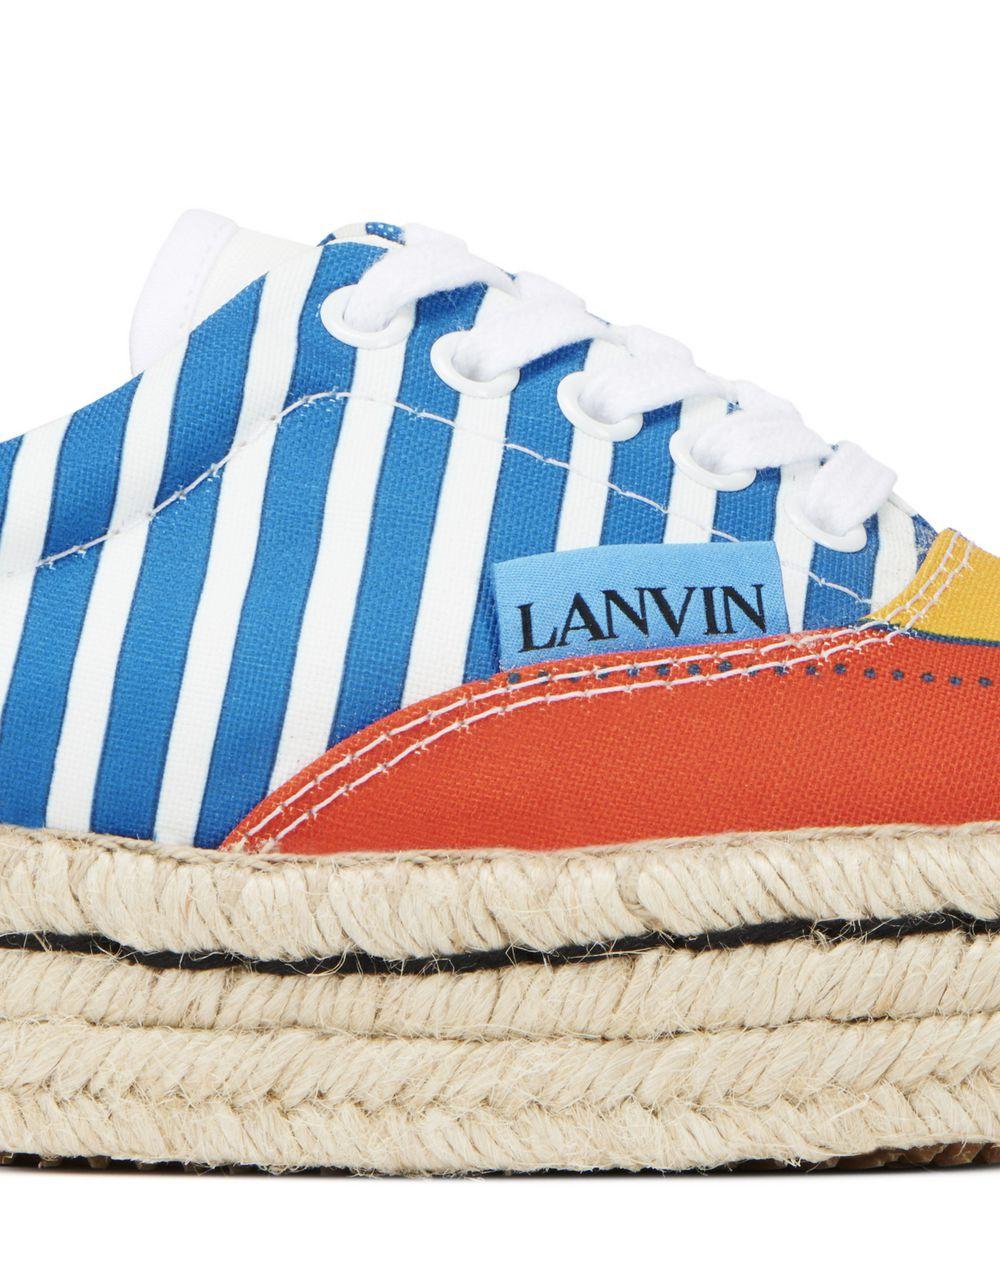 LANVIN FLAGS ESPADRILLE SNEAKER - Lanvin